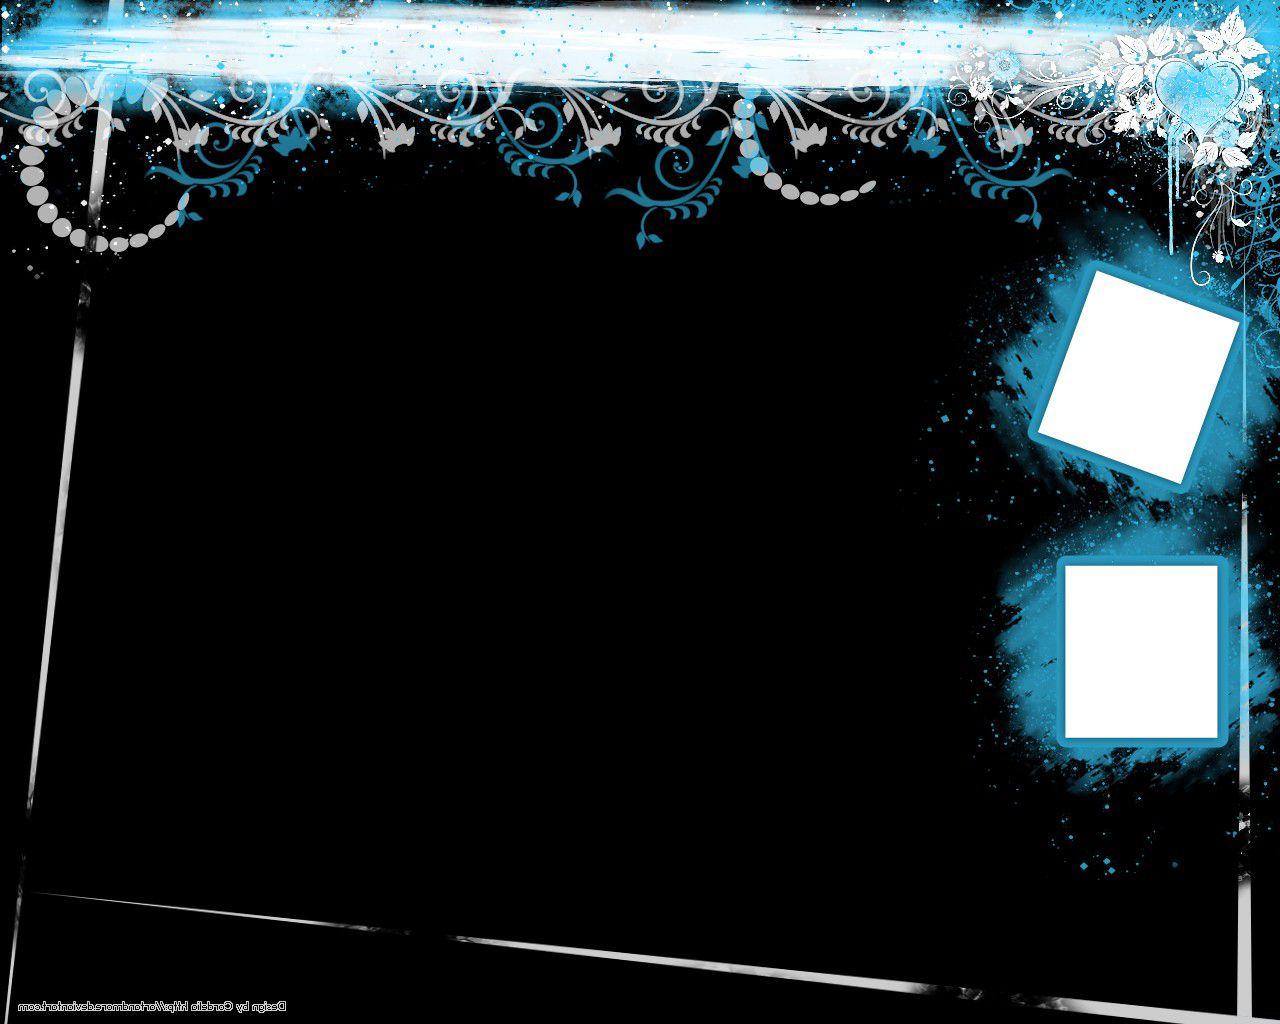 Obama free download powerpoint template obama free download obama free download powerpoint template obama free download powerpoint template free download microsoft powerpoint presentation free toneelgroepblik Choice Image